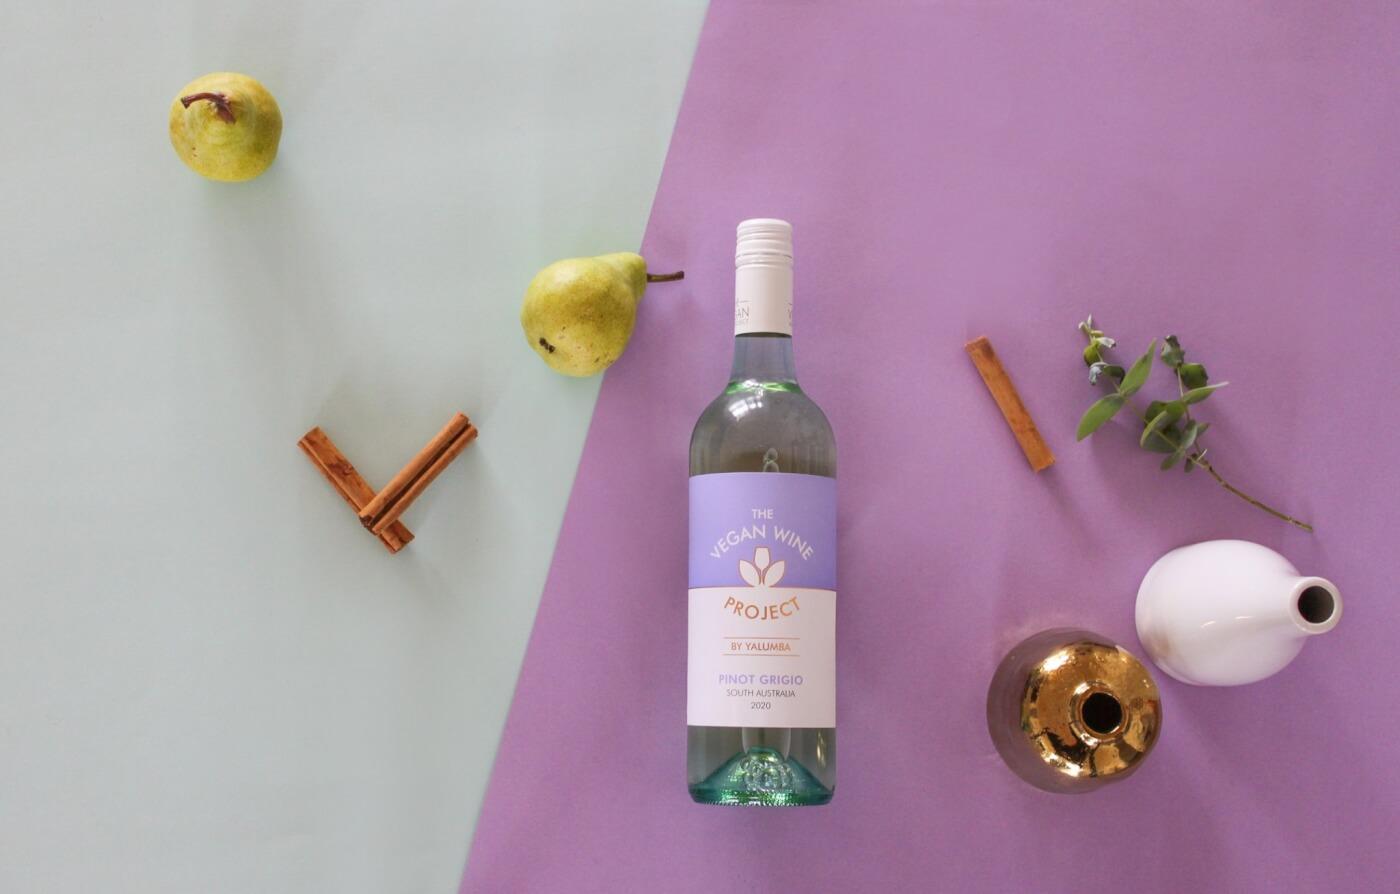 The Vegan Wine Project